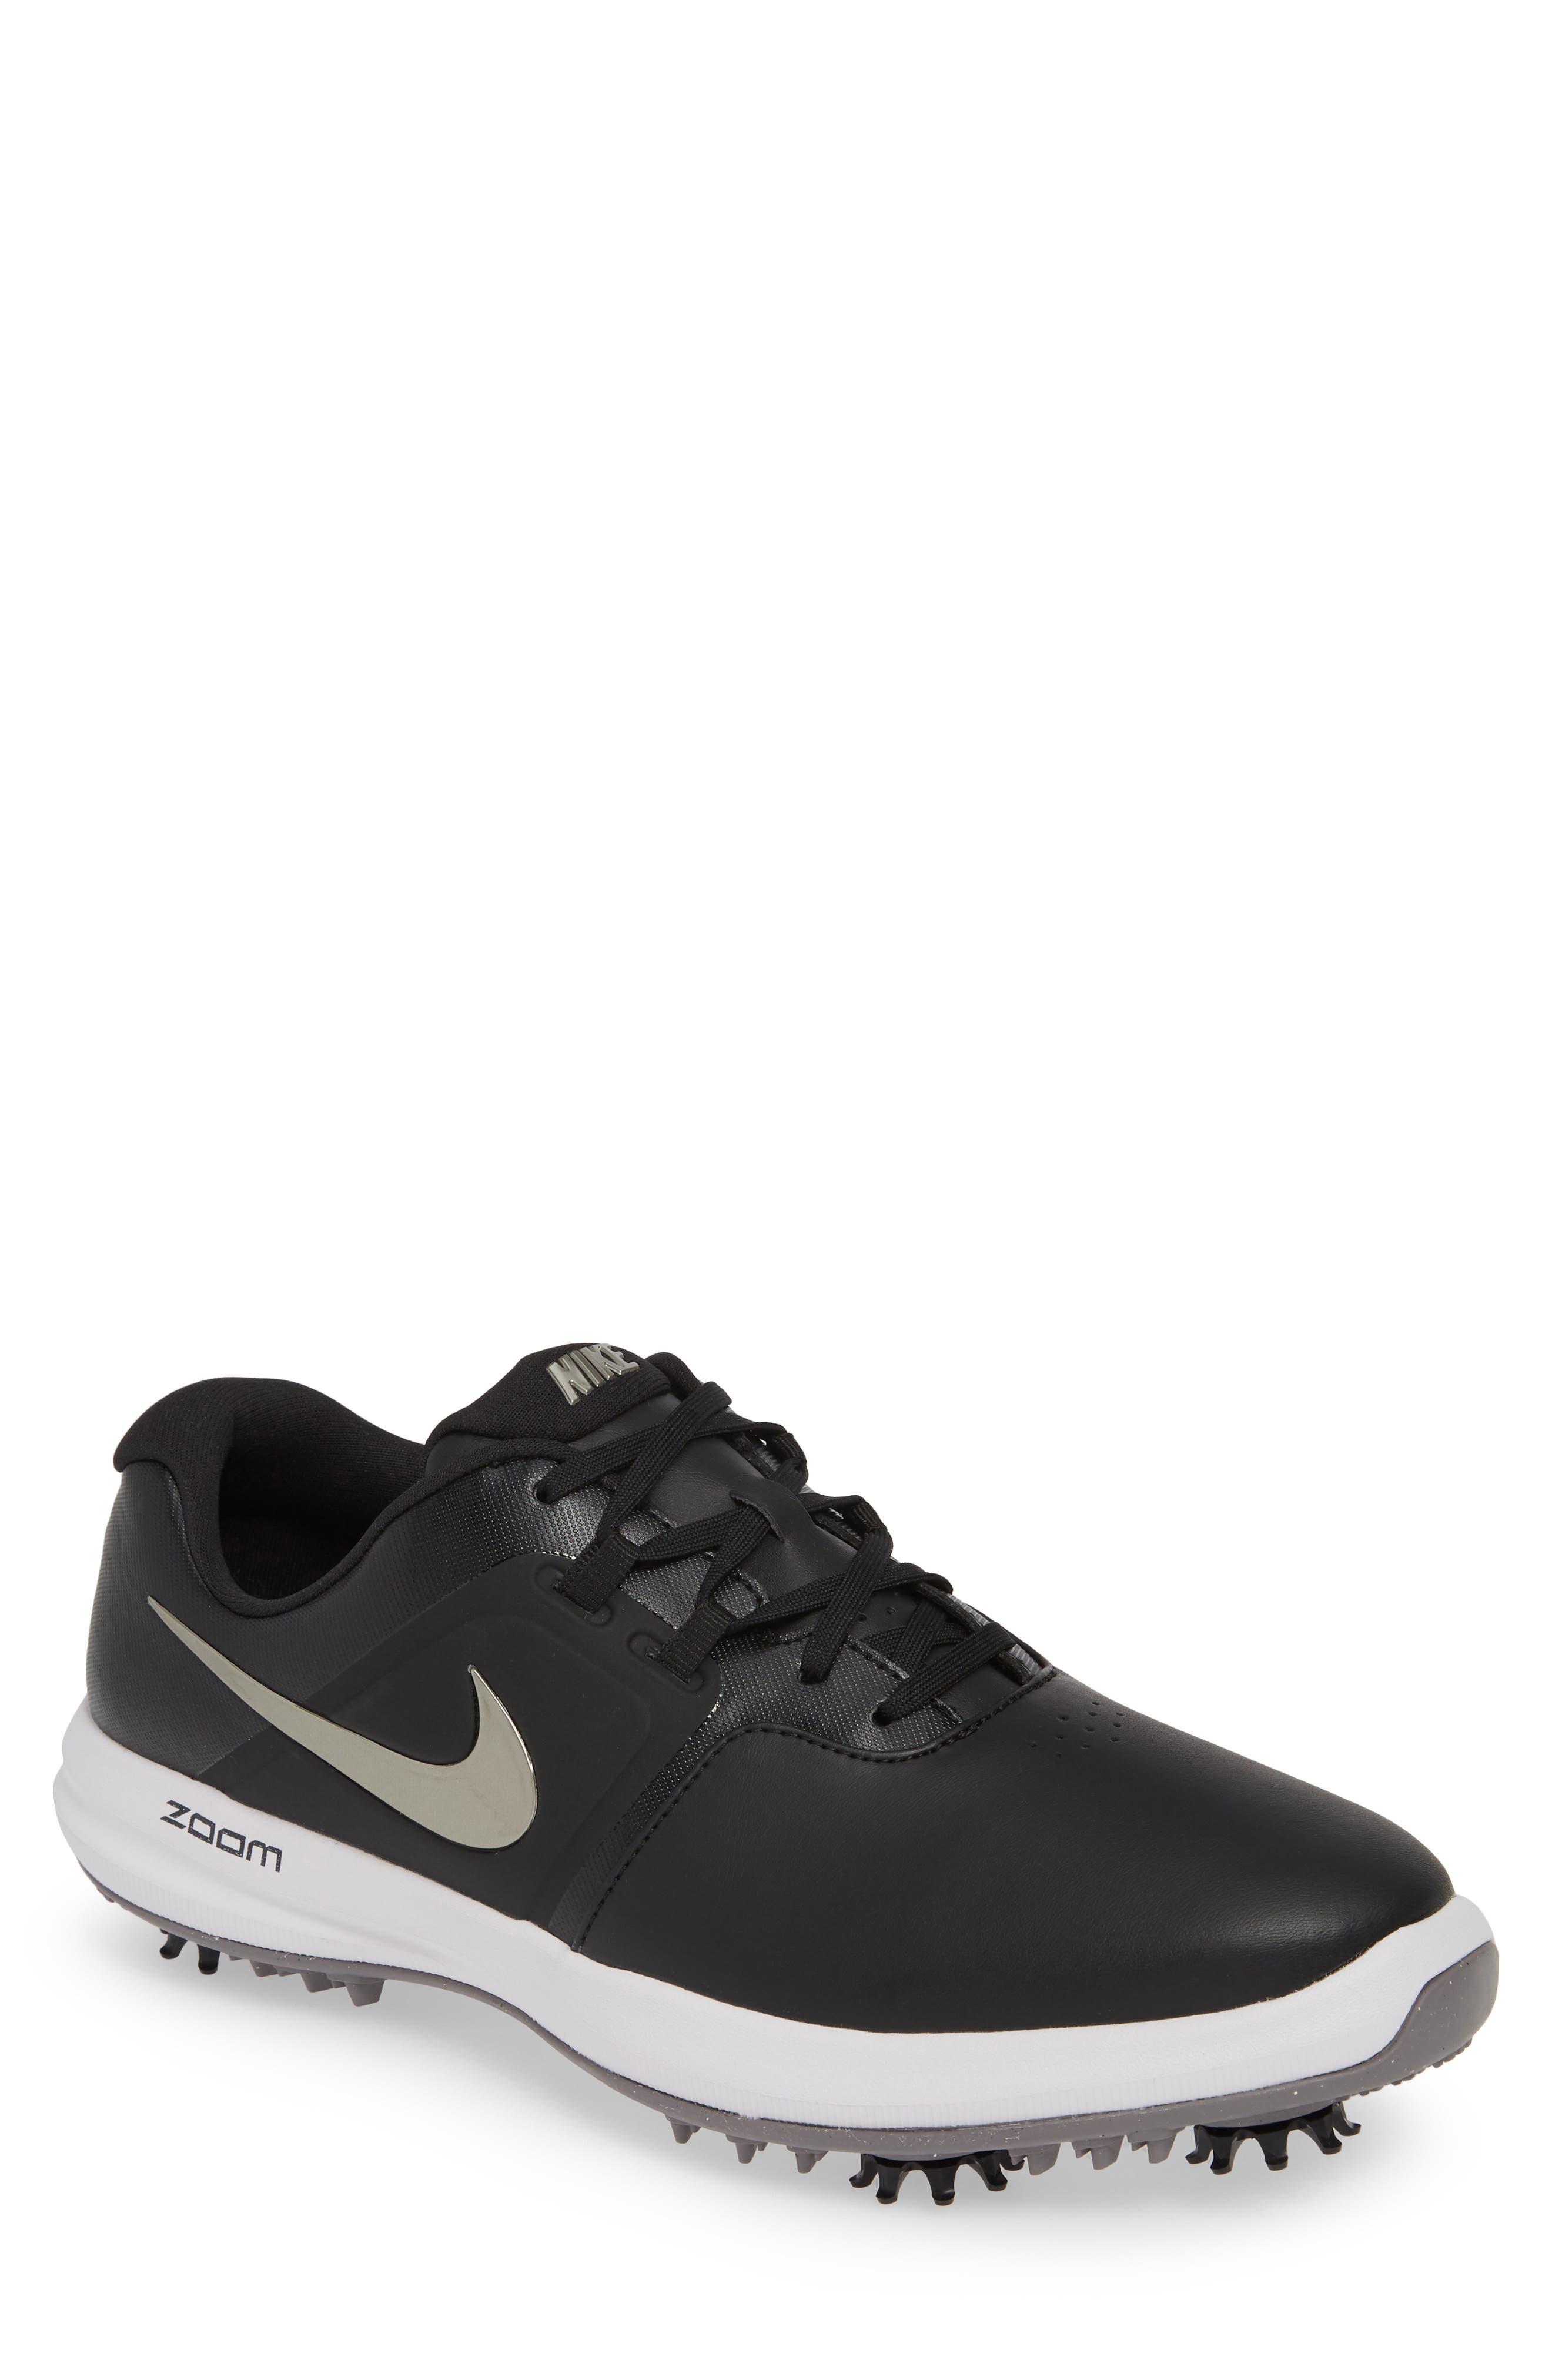 NIKE, Air Zoom Victory Golf Shoe, Main thumbnail 1, color, BLACK/ PEWTER/ VAST GREY